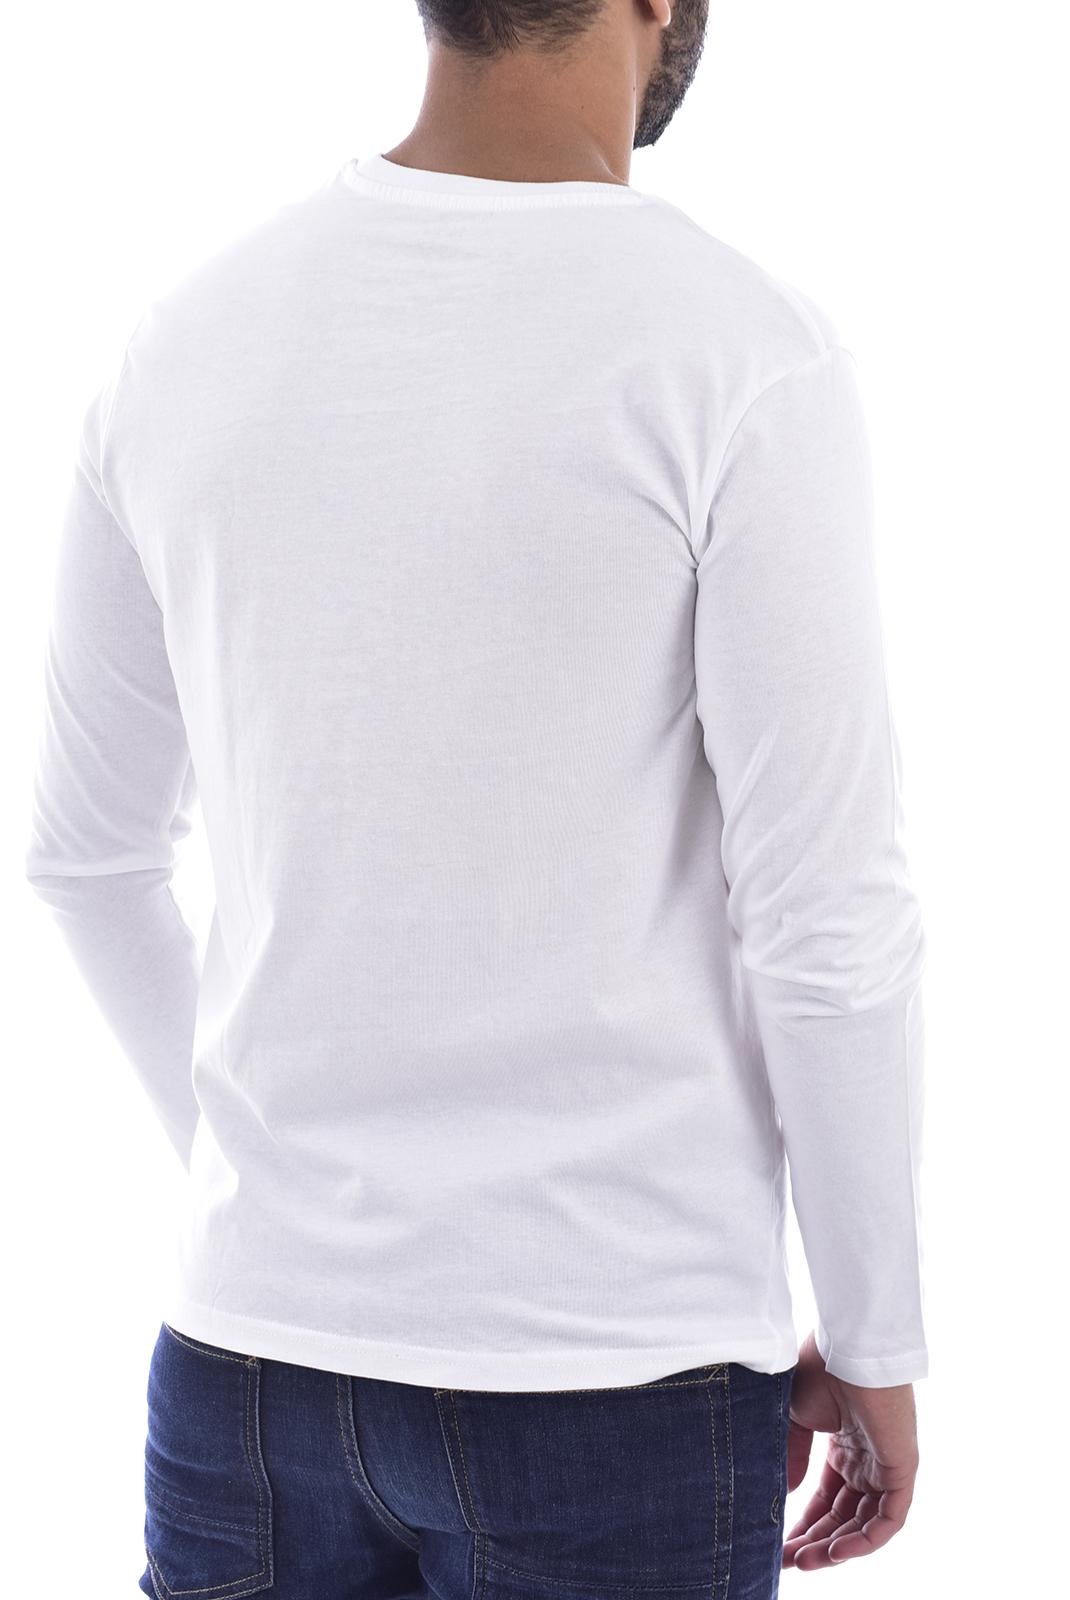 T-S manches longues  Nasa BASIC BALL O NECK LONG WHITE